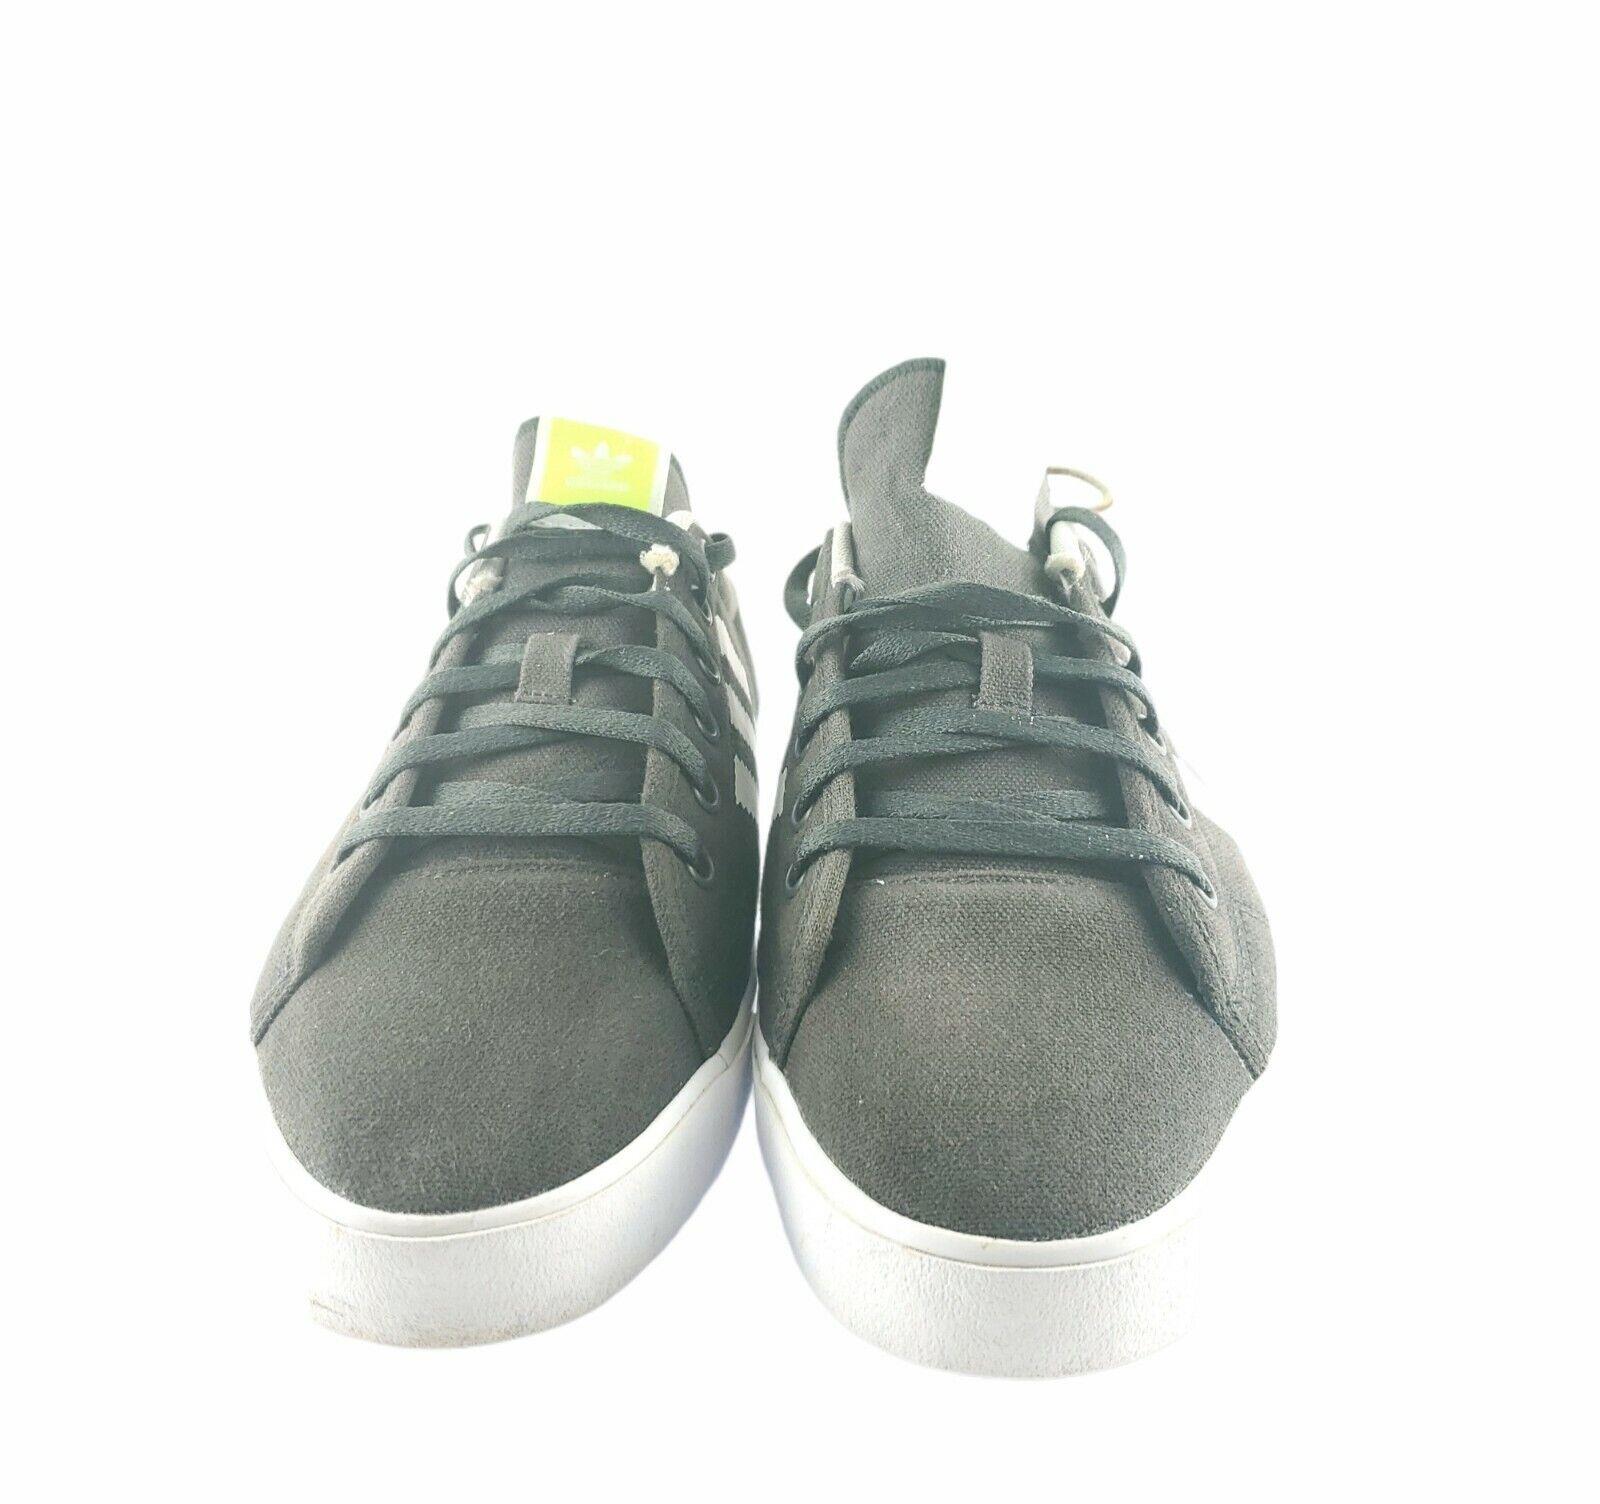 Adidas Adicourt Stripes Dark Gray Lime Stripes Size 8 1/2 Sporty USA Seller